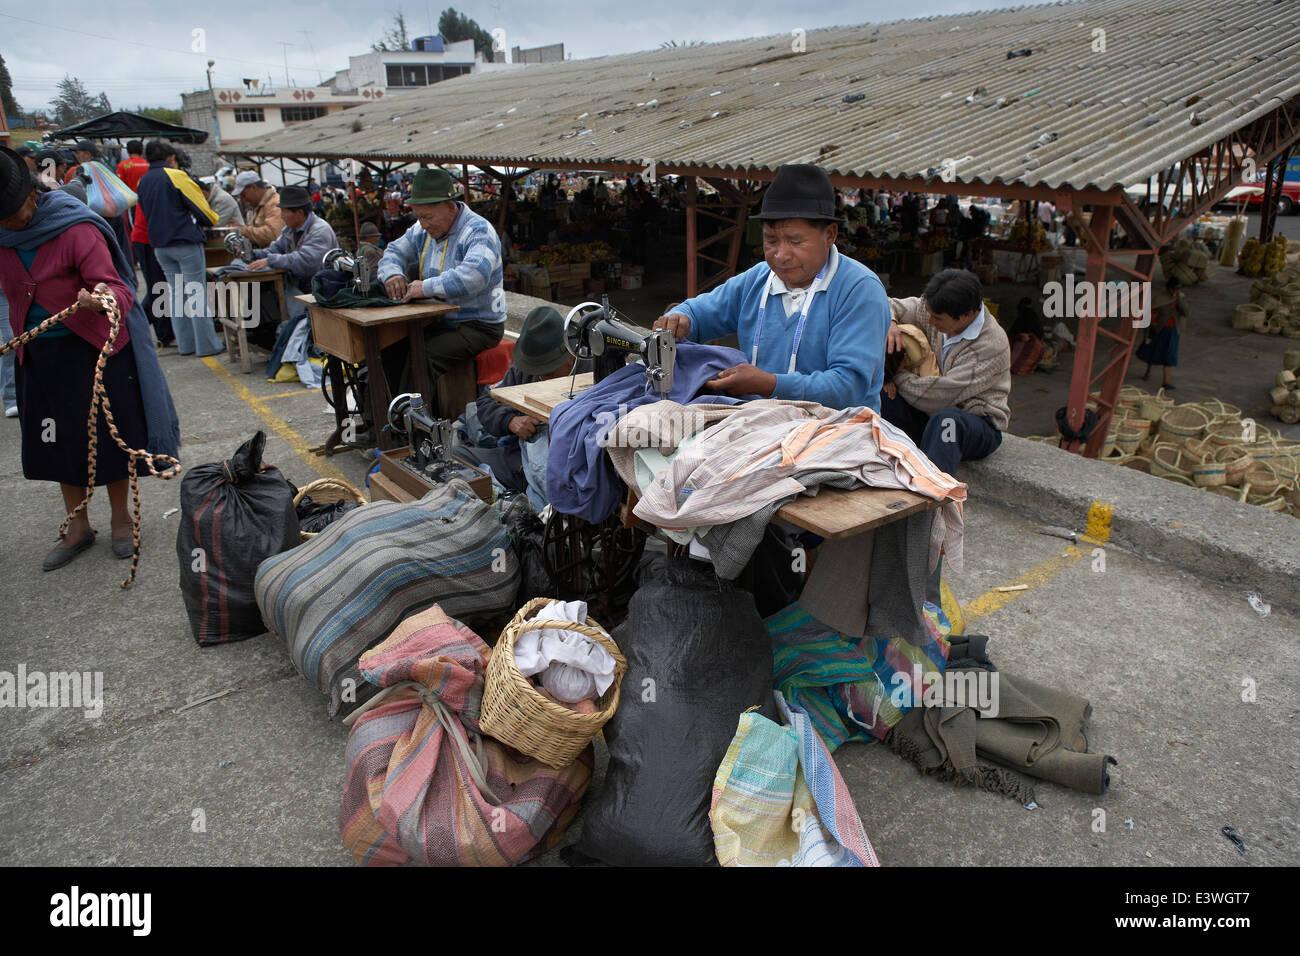 Men sewing clohes on the streets, Saquisili Market, Ecuador - Stock Image